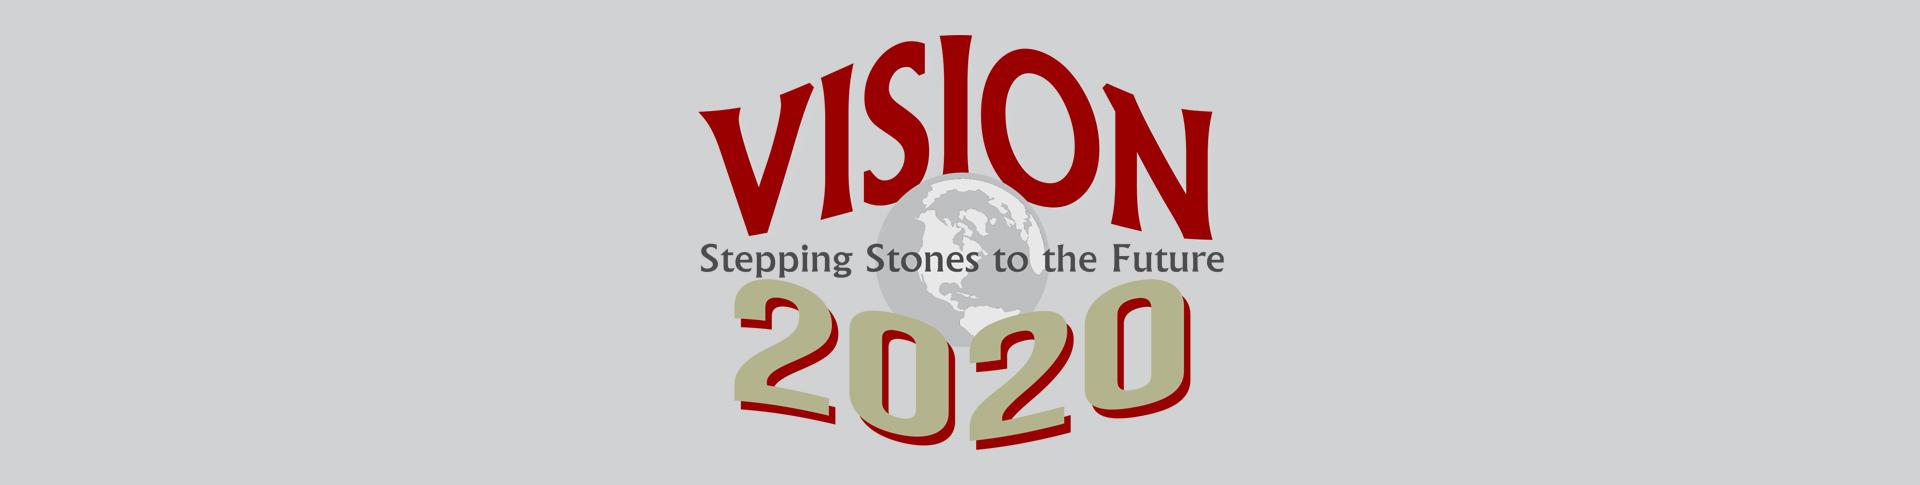 Vision2020 1920x485